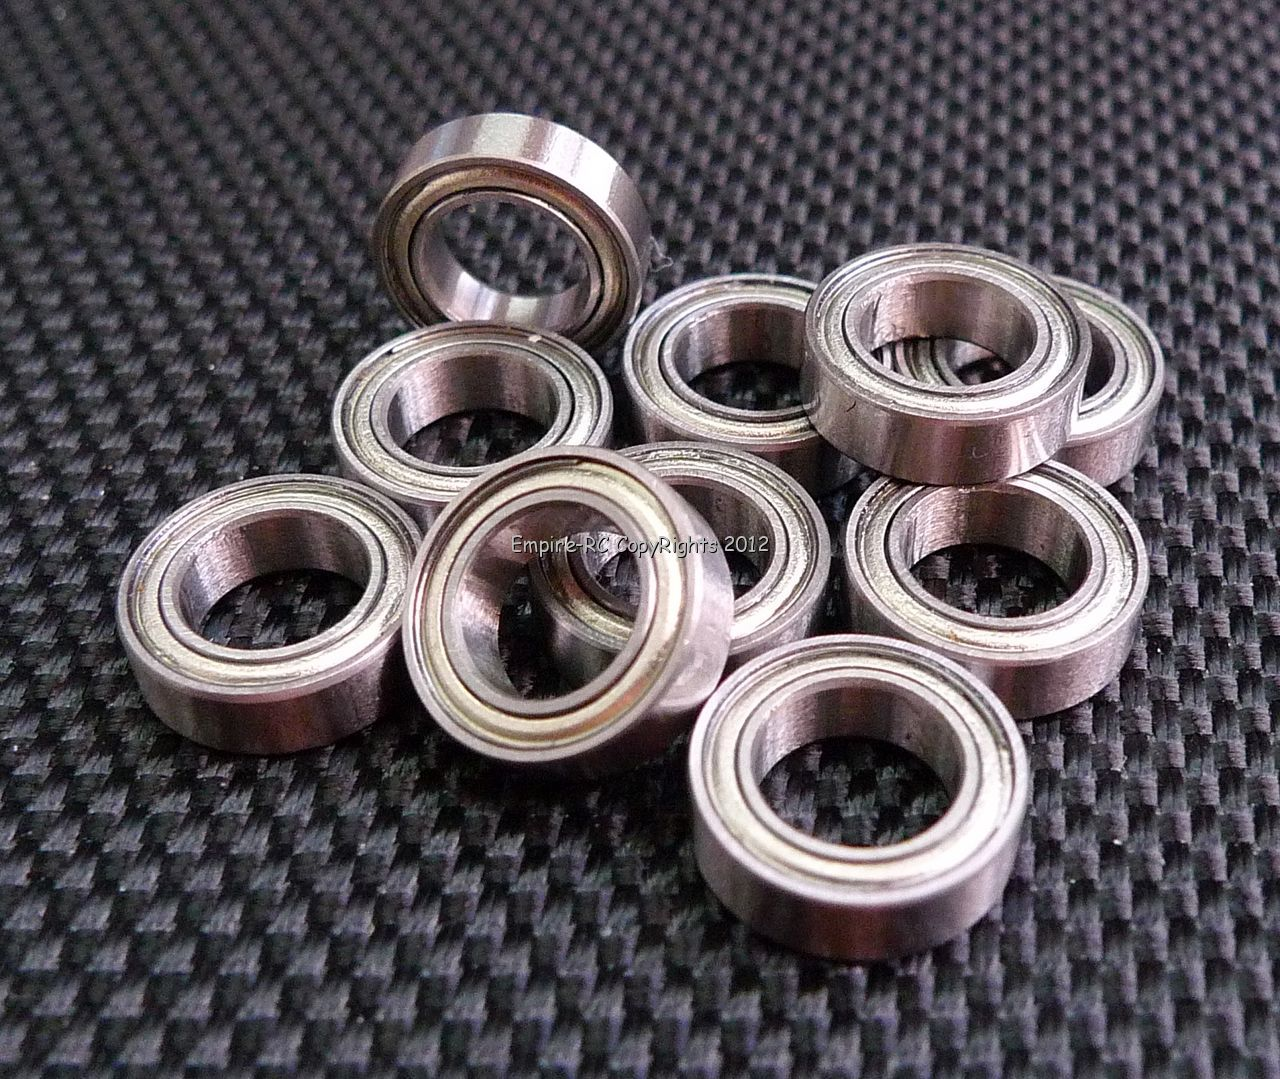 Electronic Components & Supplies 10pcs Mr105zz Miniature Ball Bearing Mr105z Mr105 5*10*4 Deep Groove Ball Bearing 5x10x4 Mm